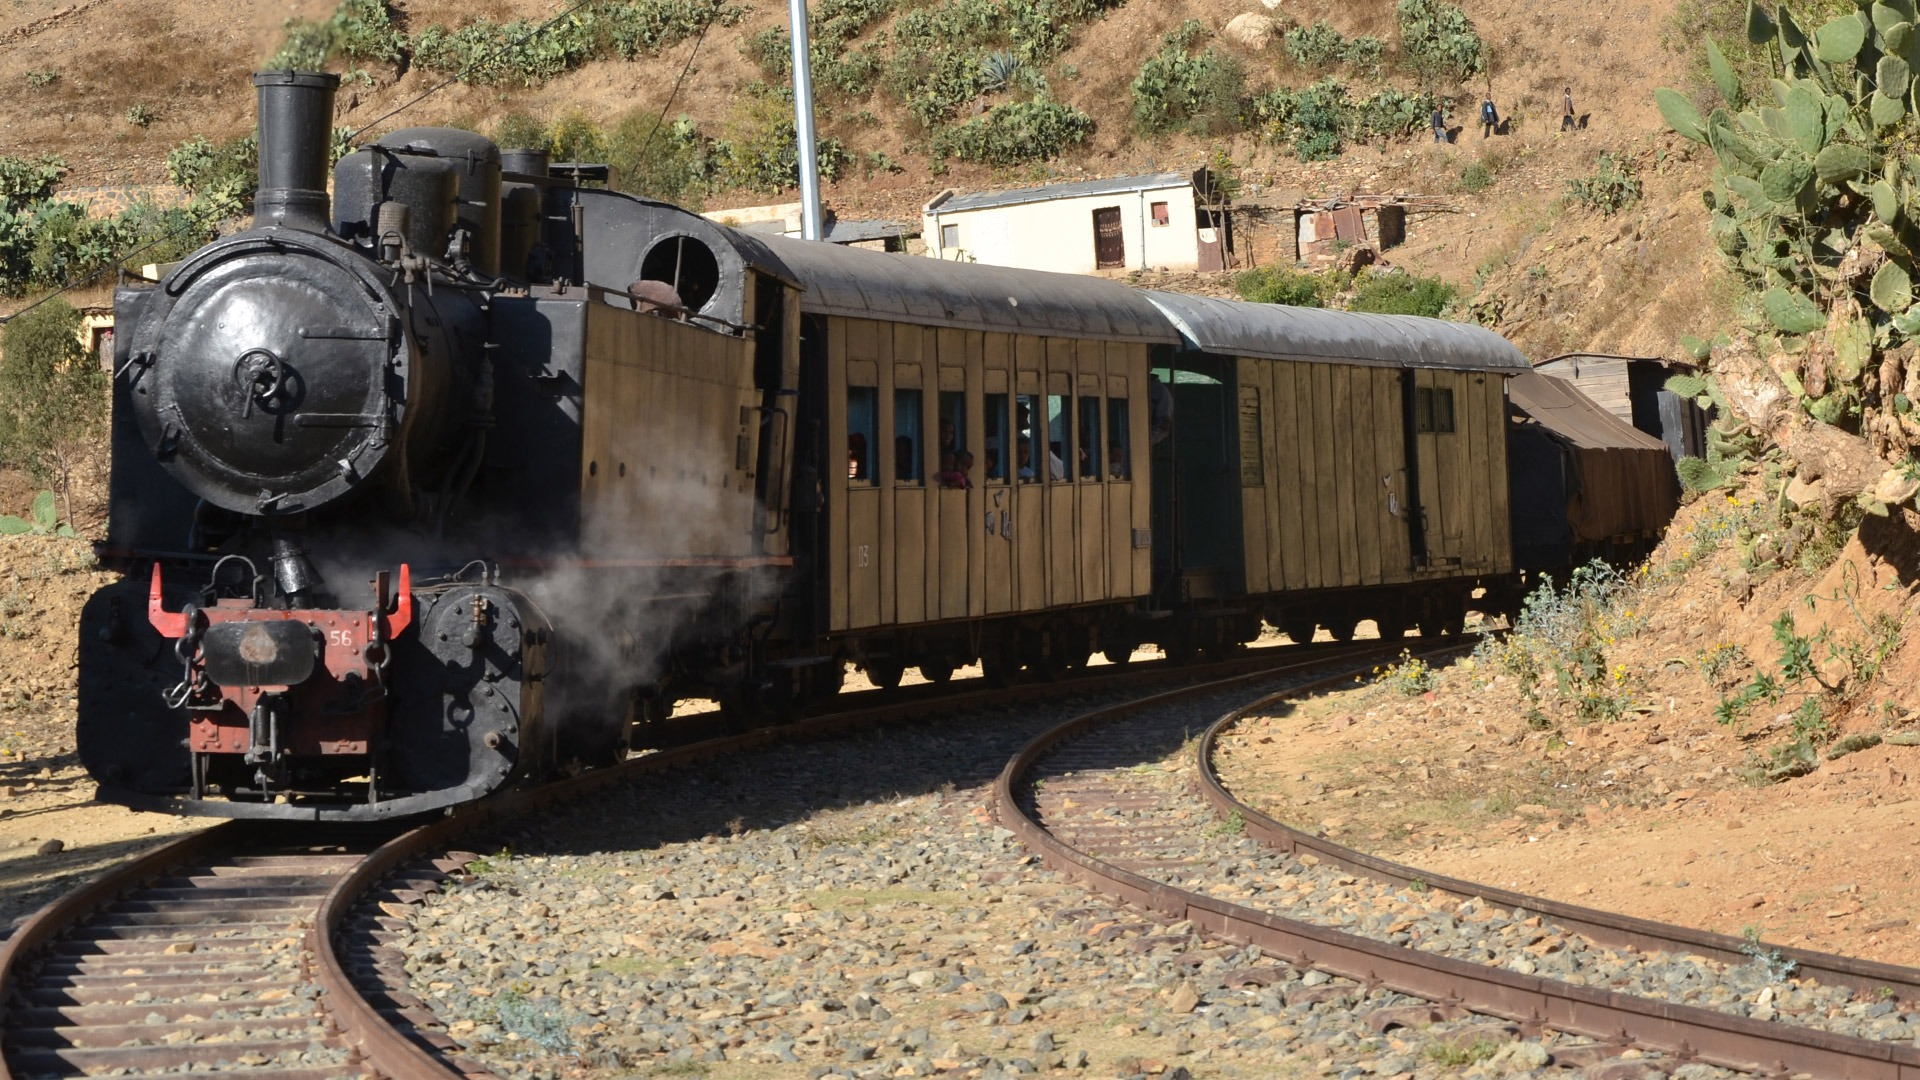 A stream train on the Eritrean Railway out of Asmara, Eritrea